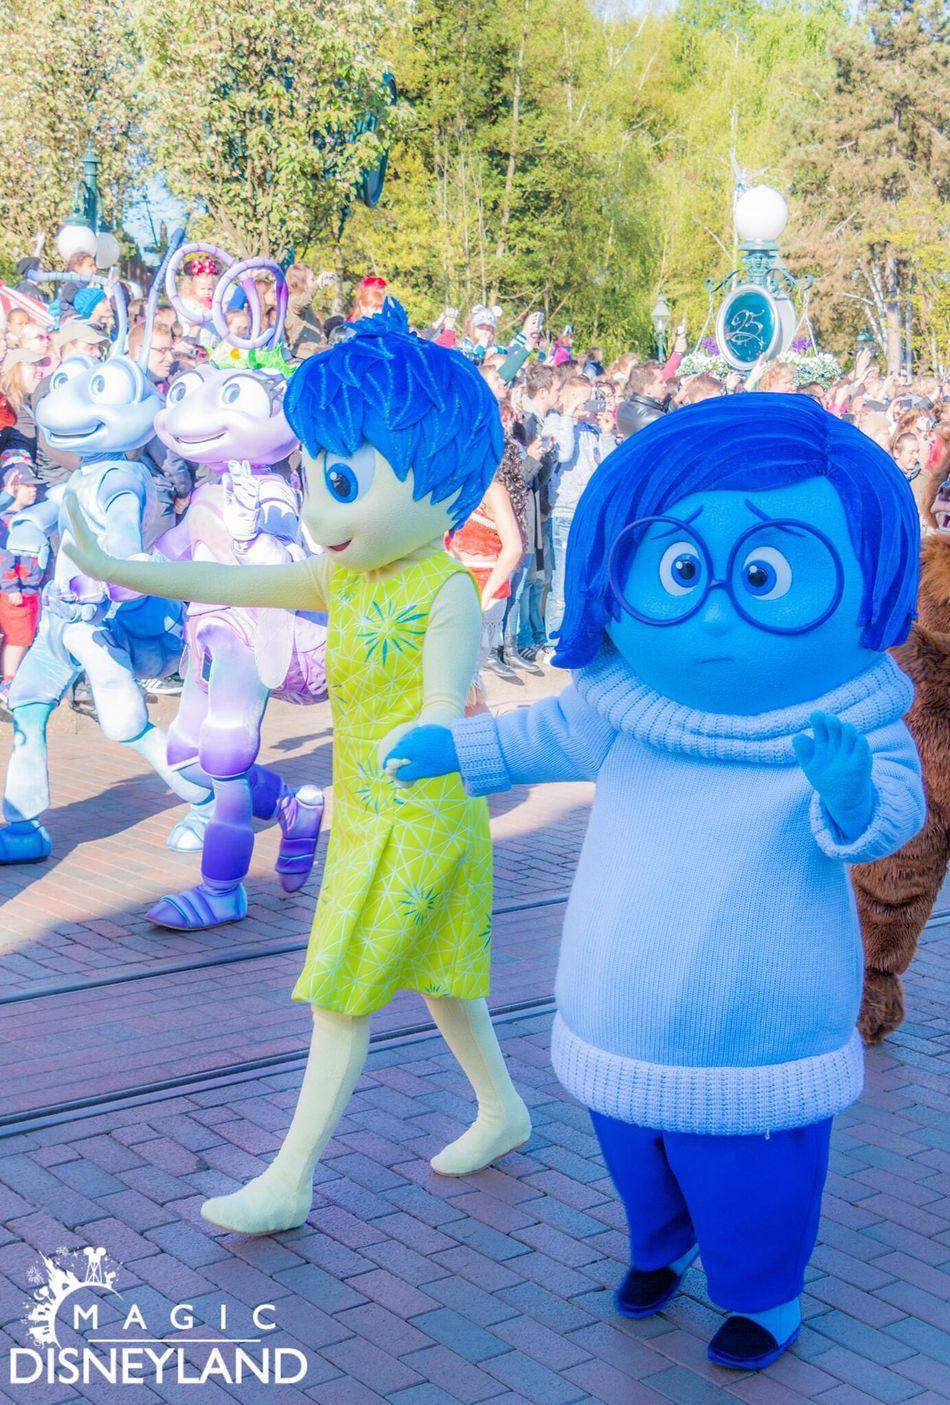 Doll Childhood Blue Disneyland Resort Paris Multi Colored Disneyland 25thanniversary Flower Travel Destinations Disneylandparis Disneyland Paris Celebration Amusement Park Disney